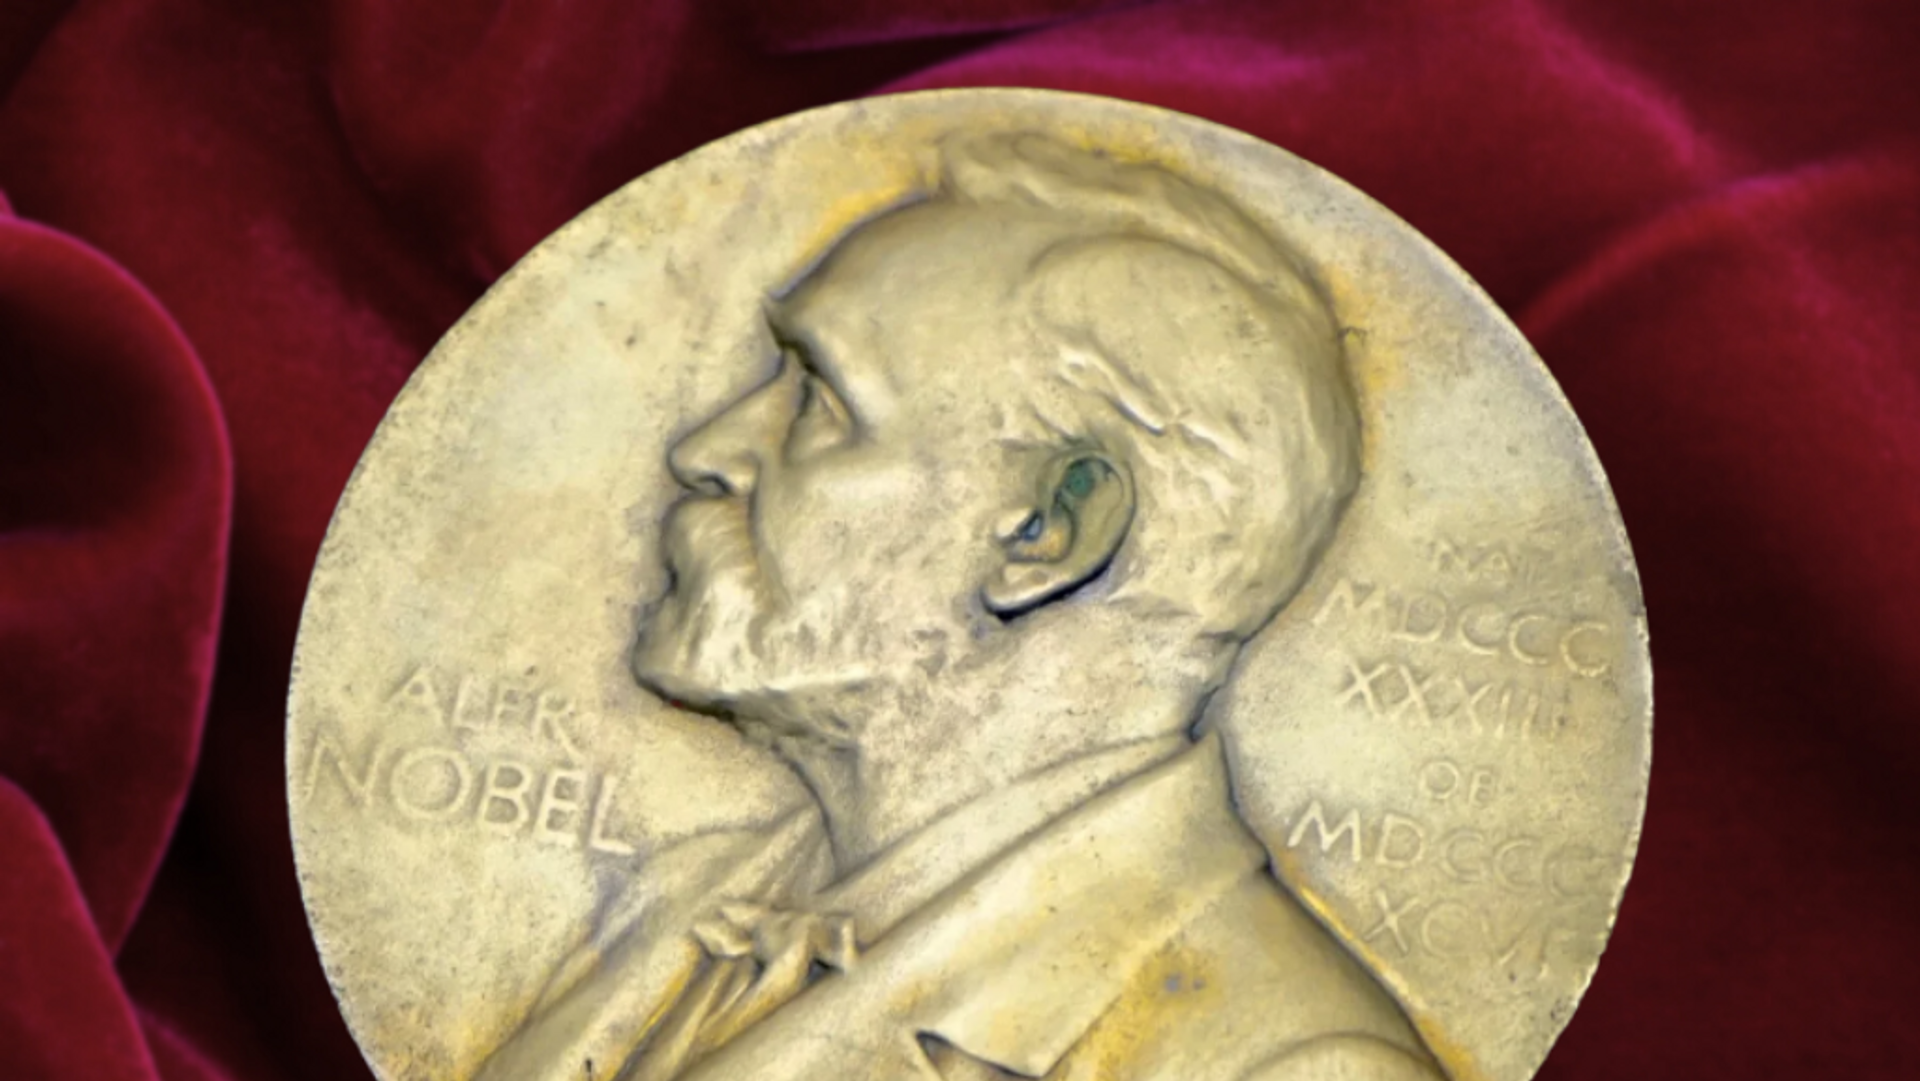 Nobelpreis (Symbolbild) - SNA, 1920, 14.10.2021